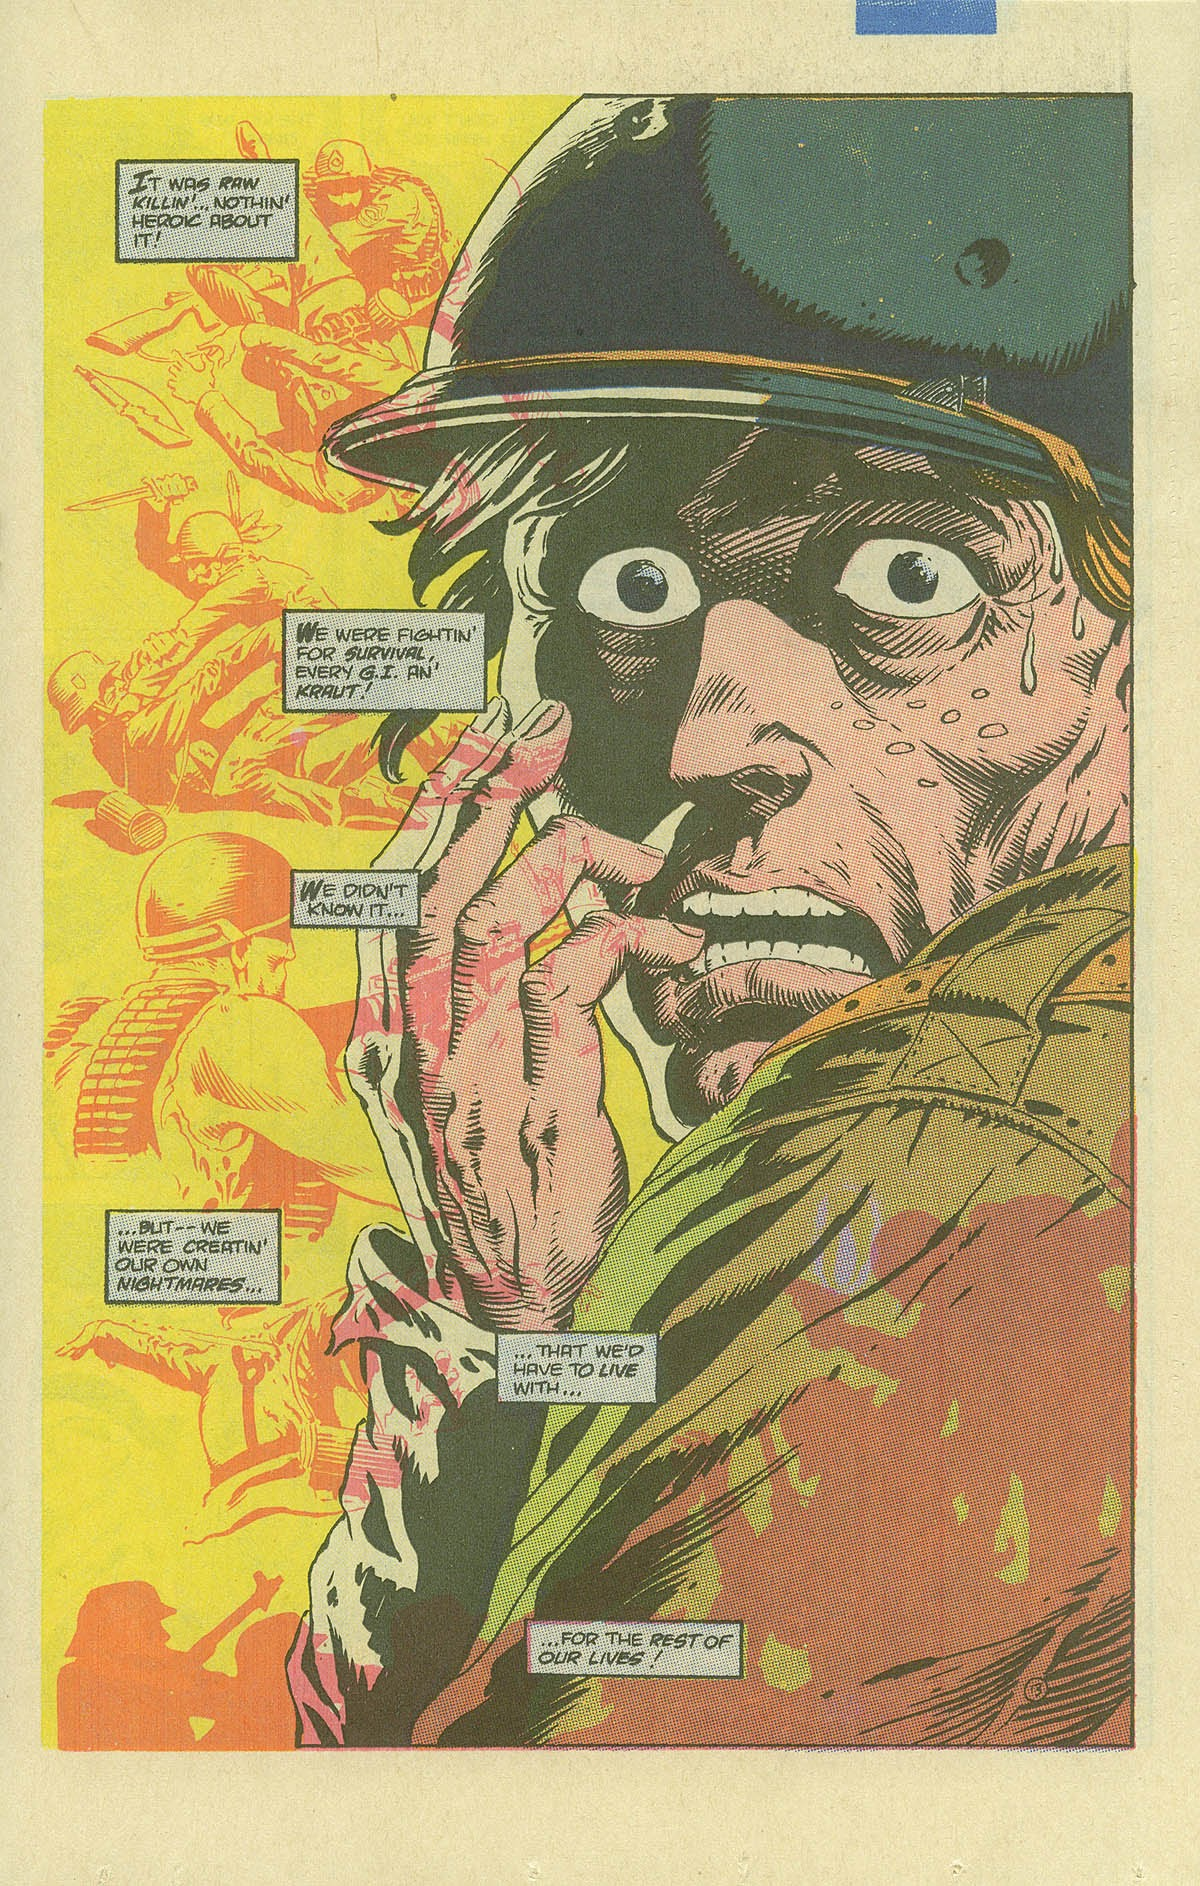 Read online Sgt. Rock comic -  Issue #408 - 18